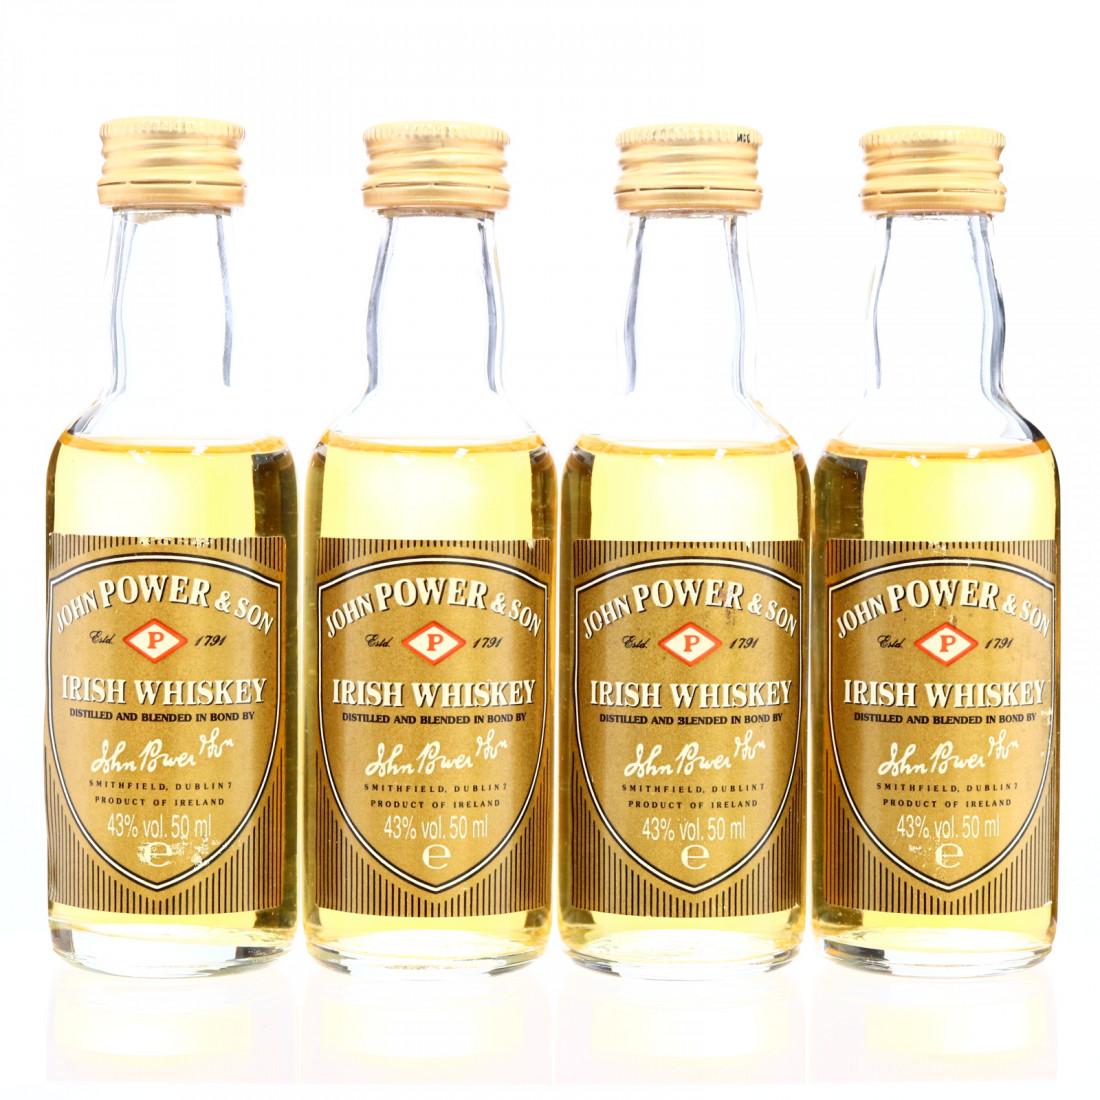 John Power & Sons Gold Label Irish Whiskey Miniature x 4